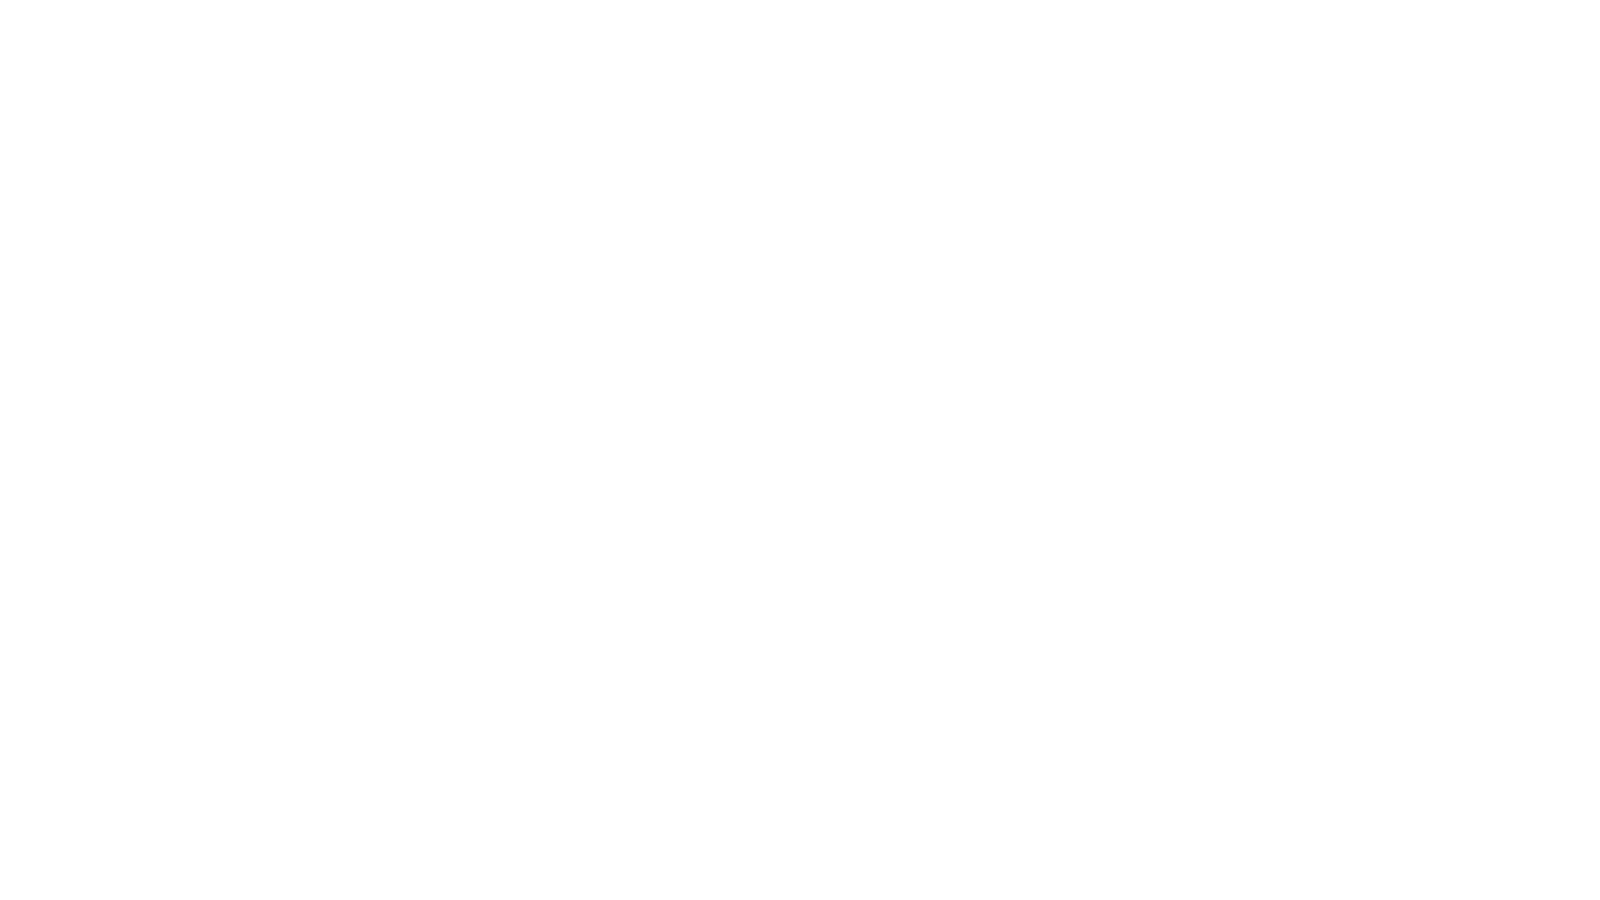 Detalles en http://www.rodeomalleco.cl/otra-tarde-gloriosa-para-peleco/  00:05 | Primer animal (Serie Campeones) 00:38 | Segundo animal (Serie Campeones) 01:09 | Tercer animal (Serie Campeones) 01:30 | Cuarto animal (Serie Campeones)